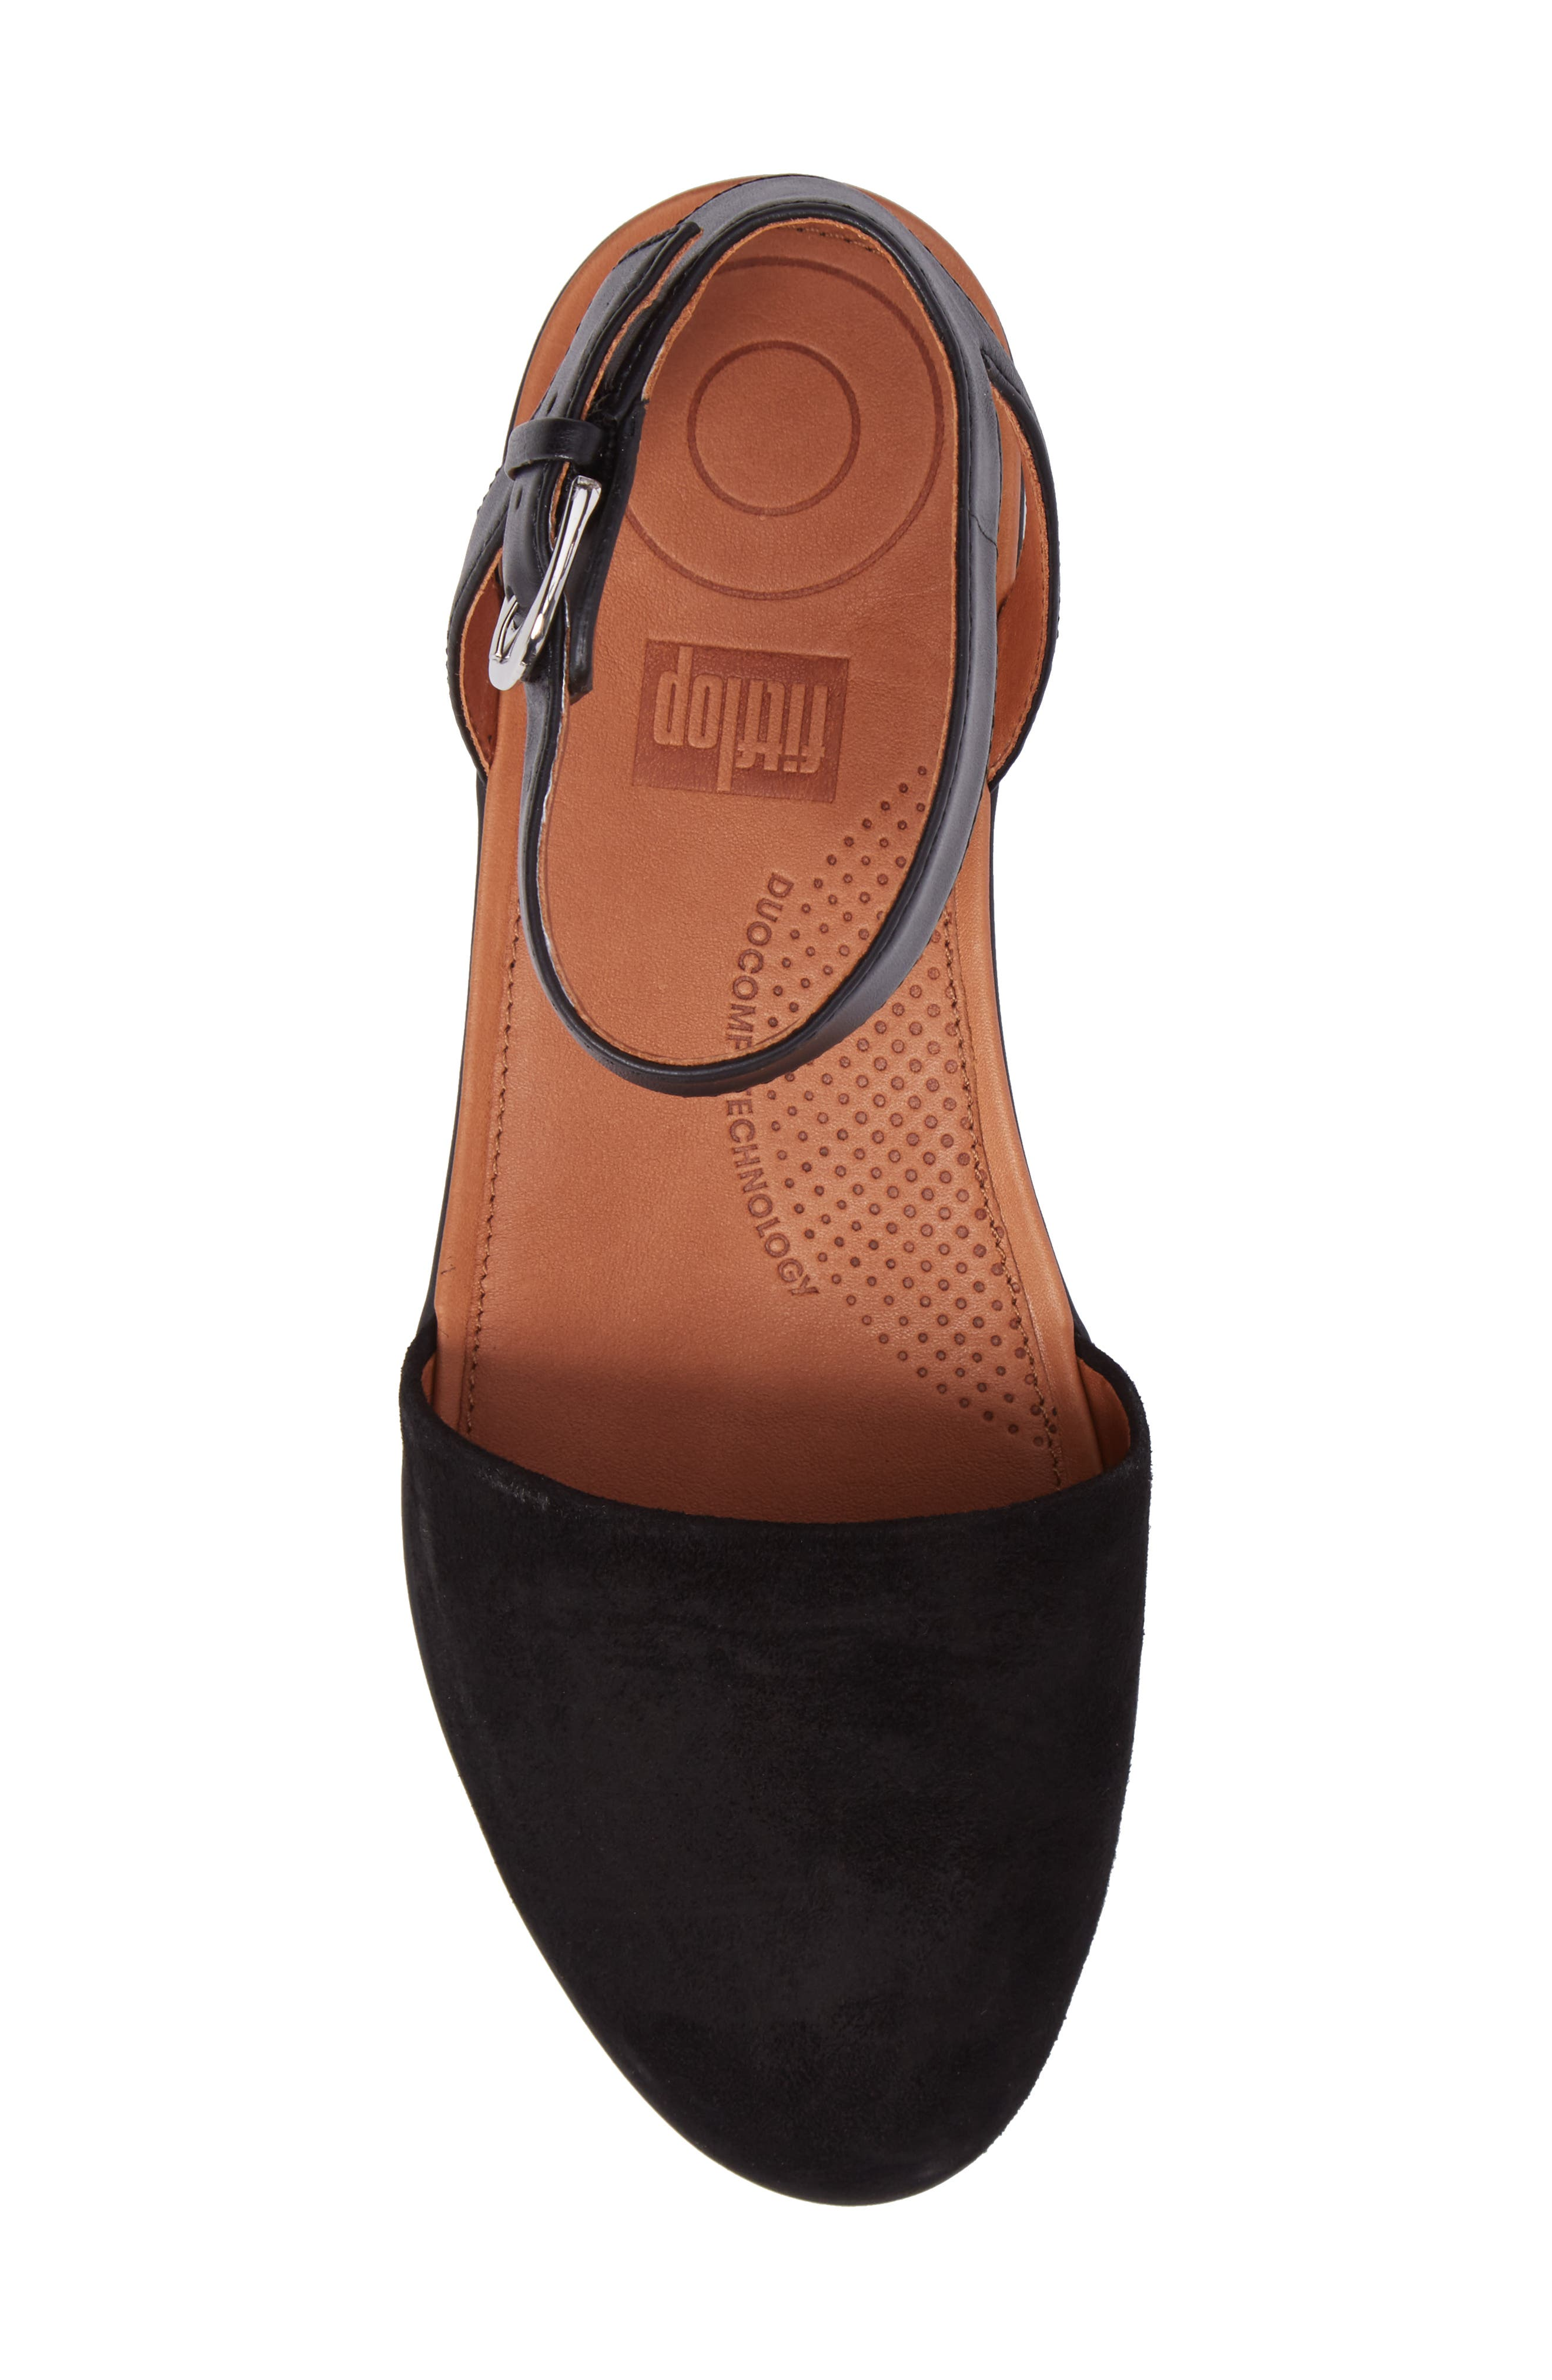 Cova Ankle Strap Sandal,                             Alternate thumbnail 5, color,                             001